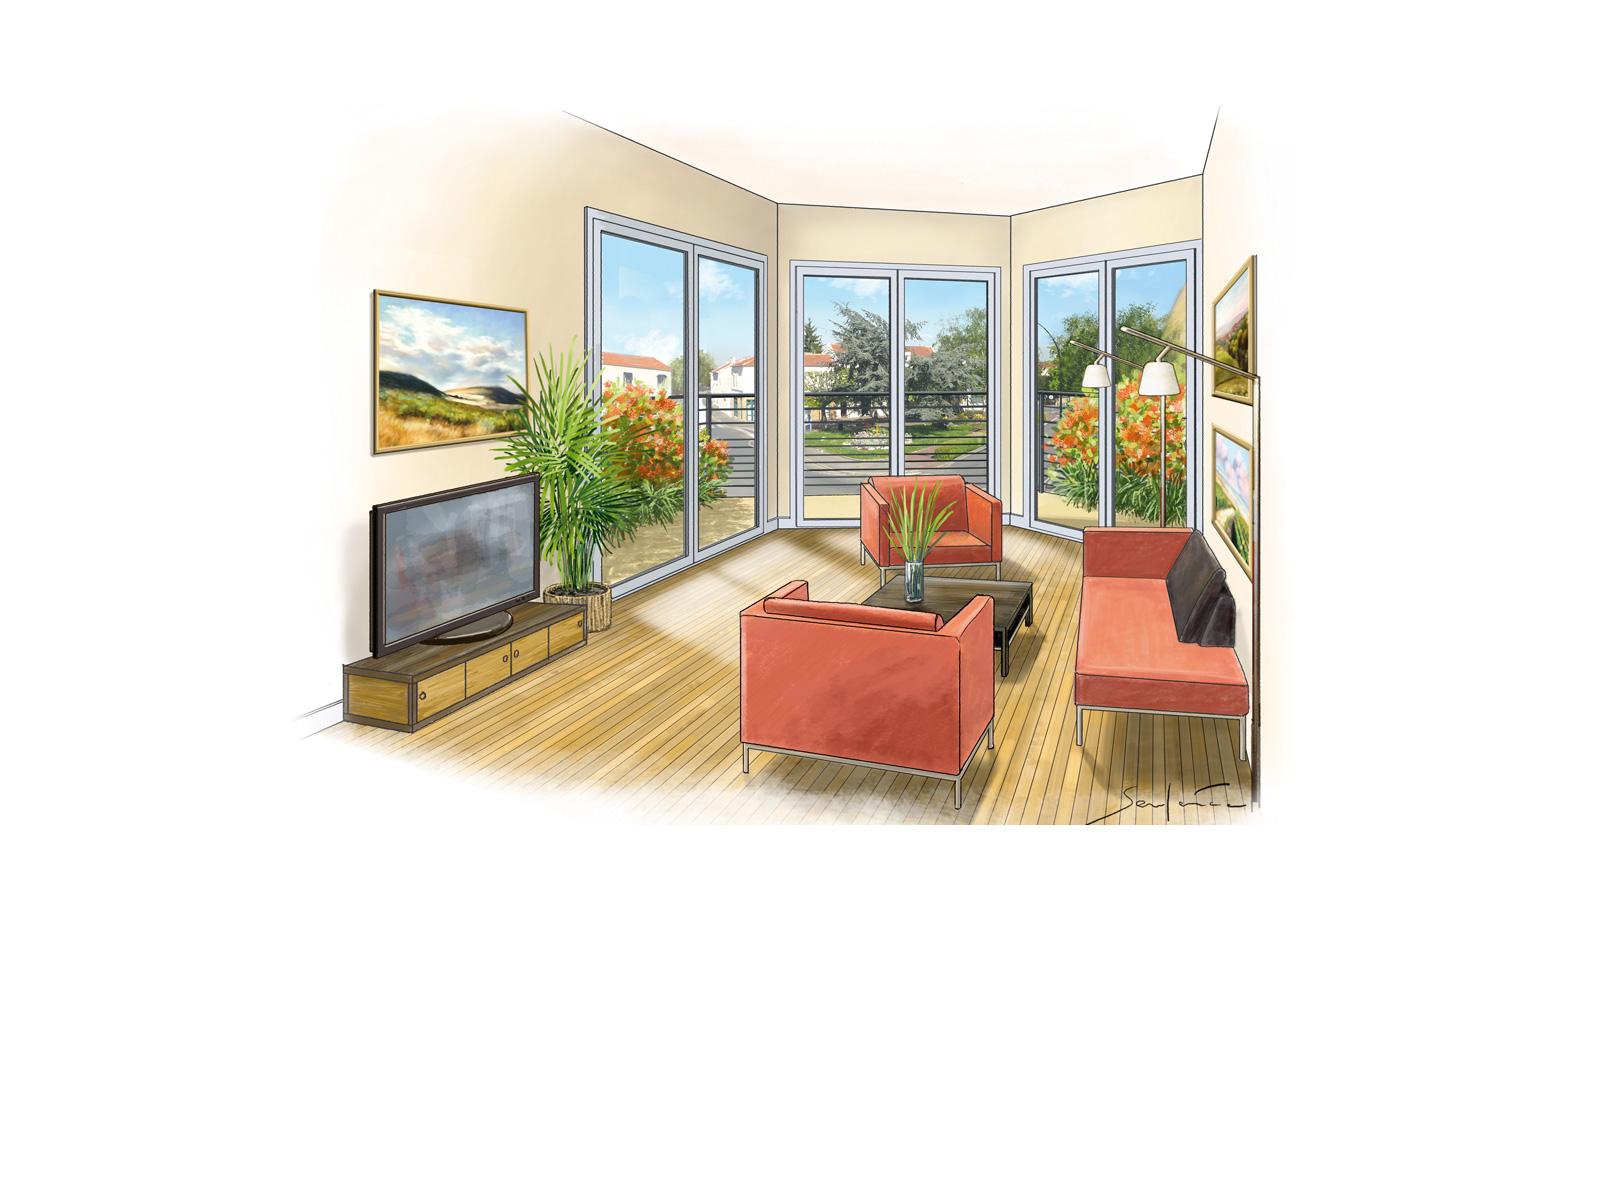 illustrations-gillessentenac-9332